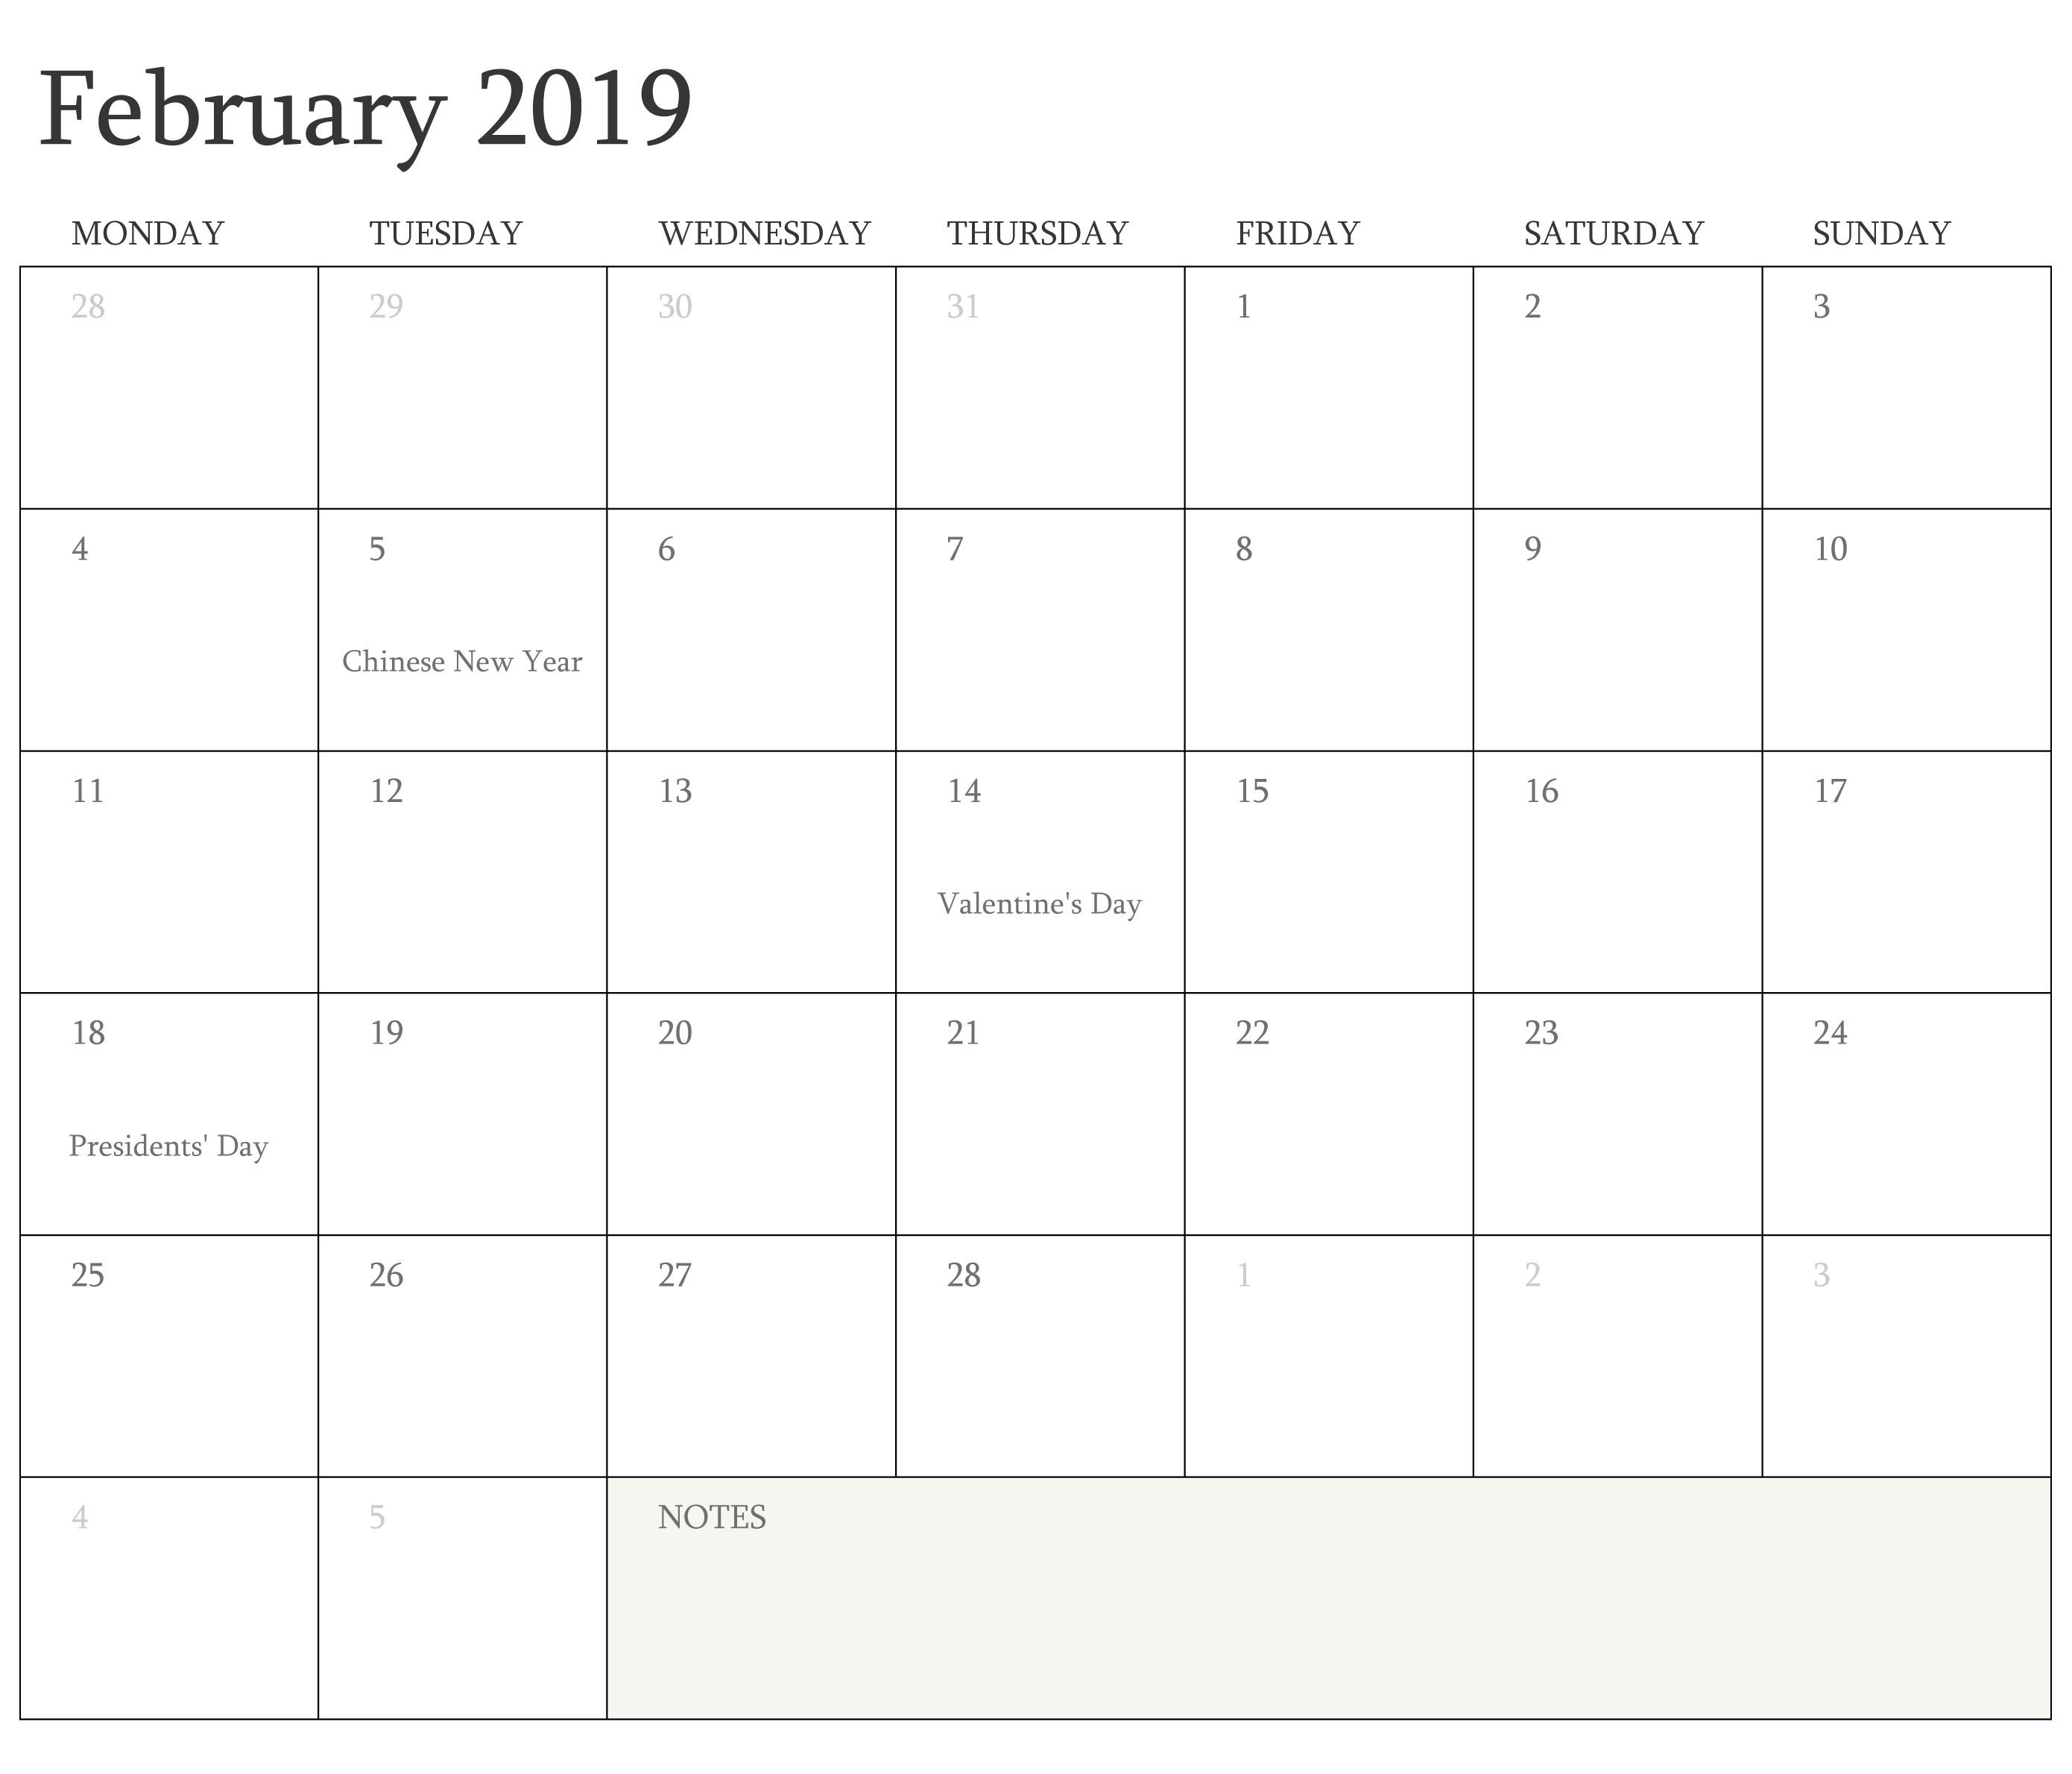 February 2019 Calendar With Holidays Printable Manage Work